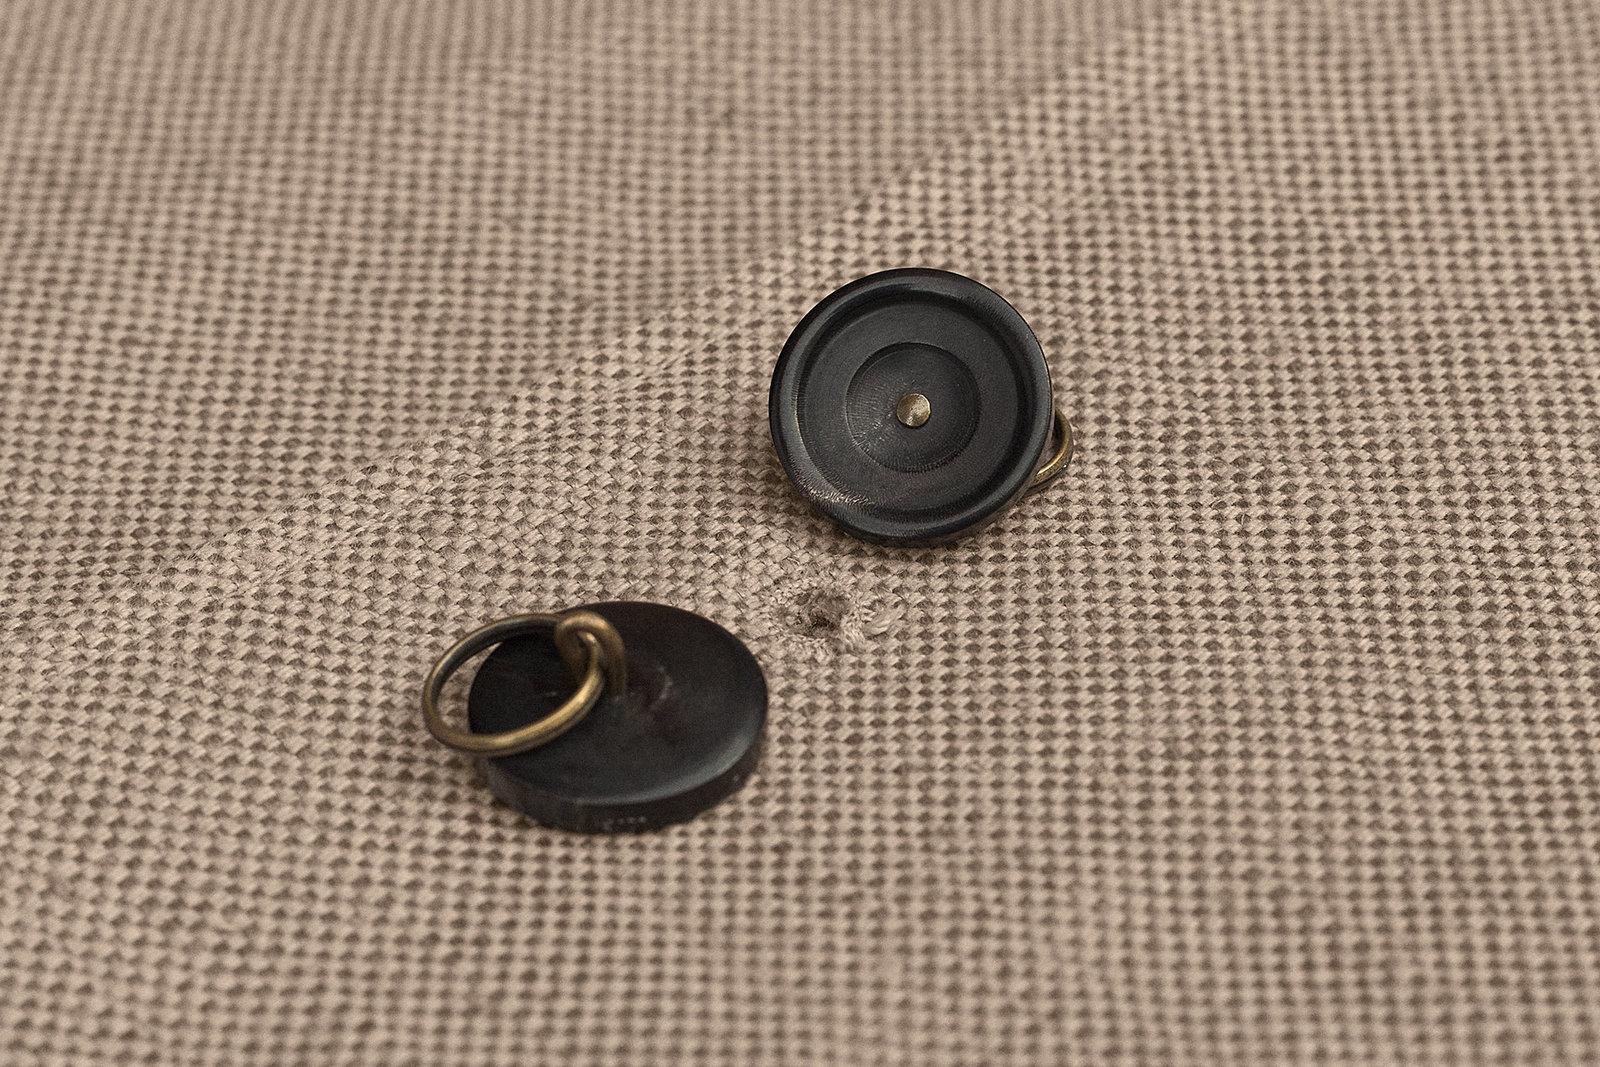 shopcoat-cotton-linen-hopsack-malt-14@2x.jpg